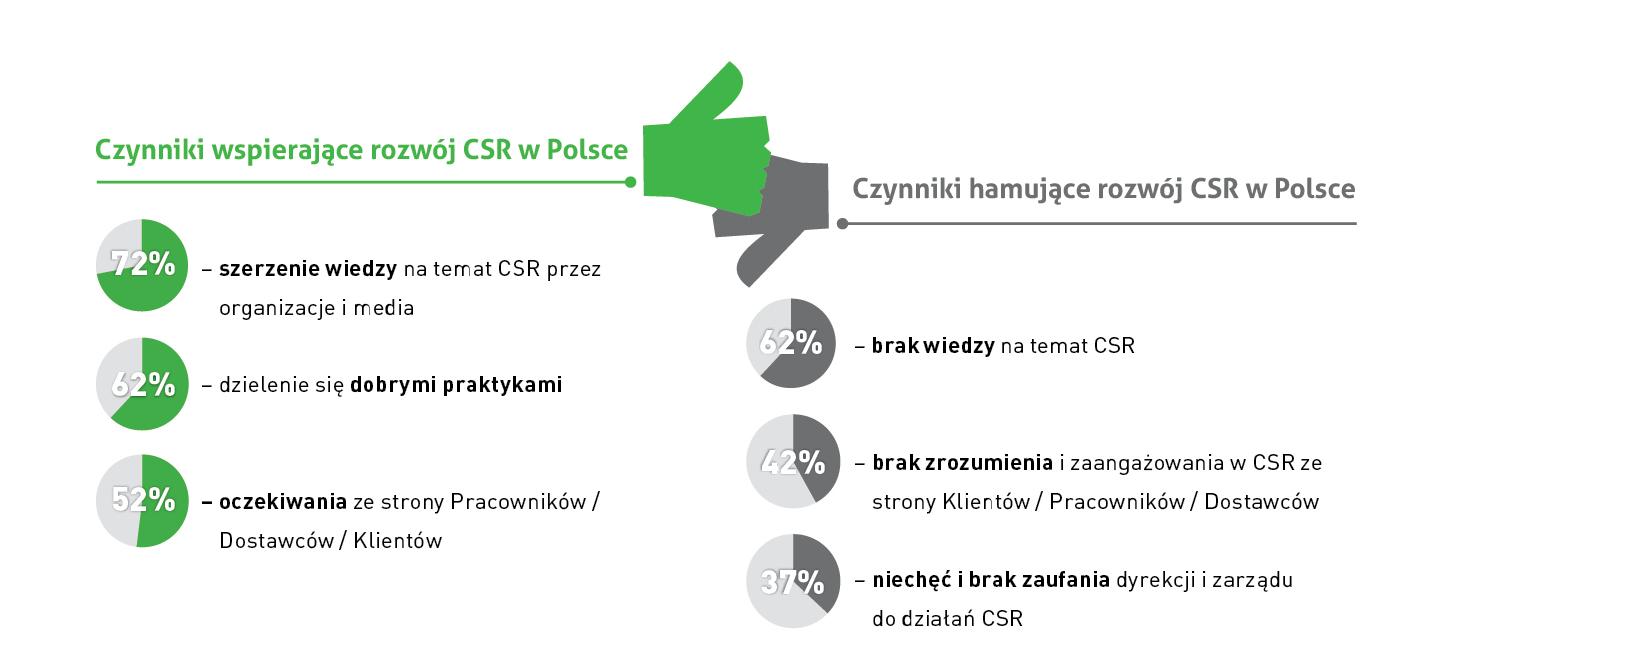 (źródło: Polsko-Francuska Izba Gospodarcza)